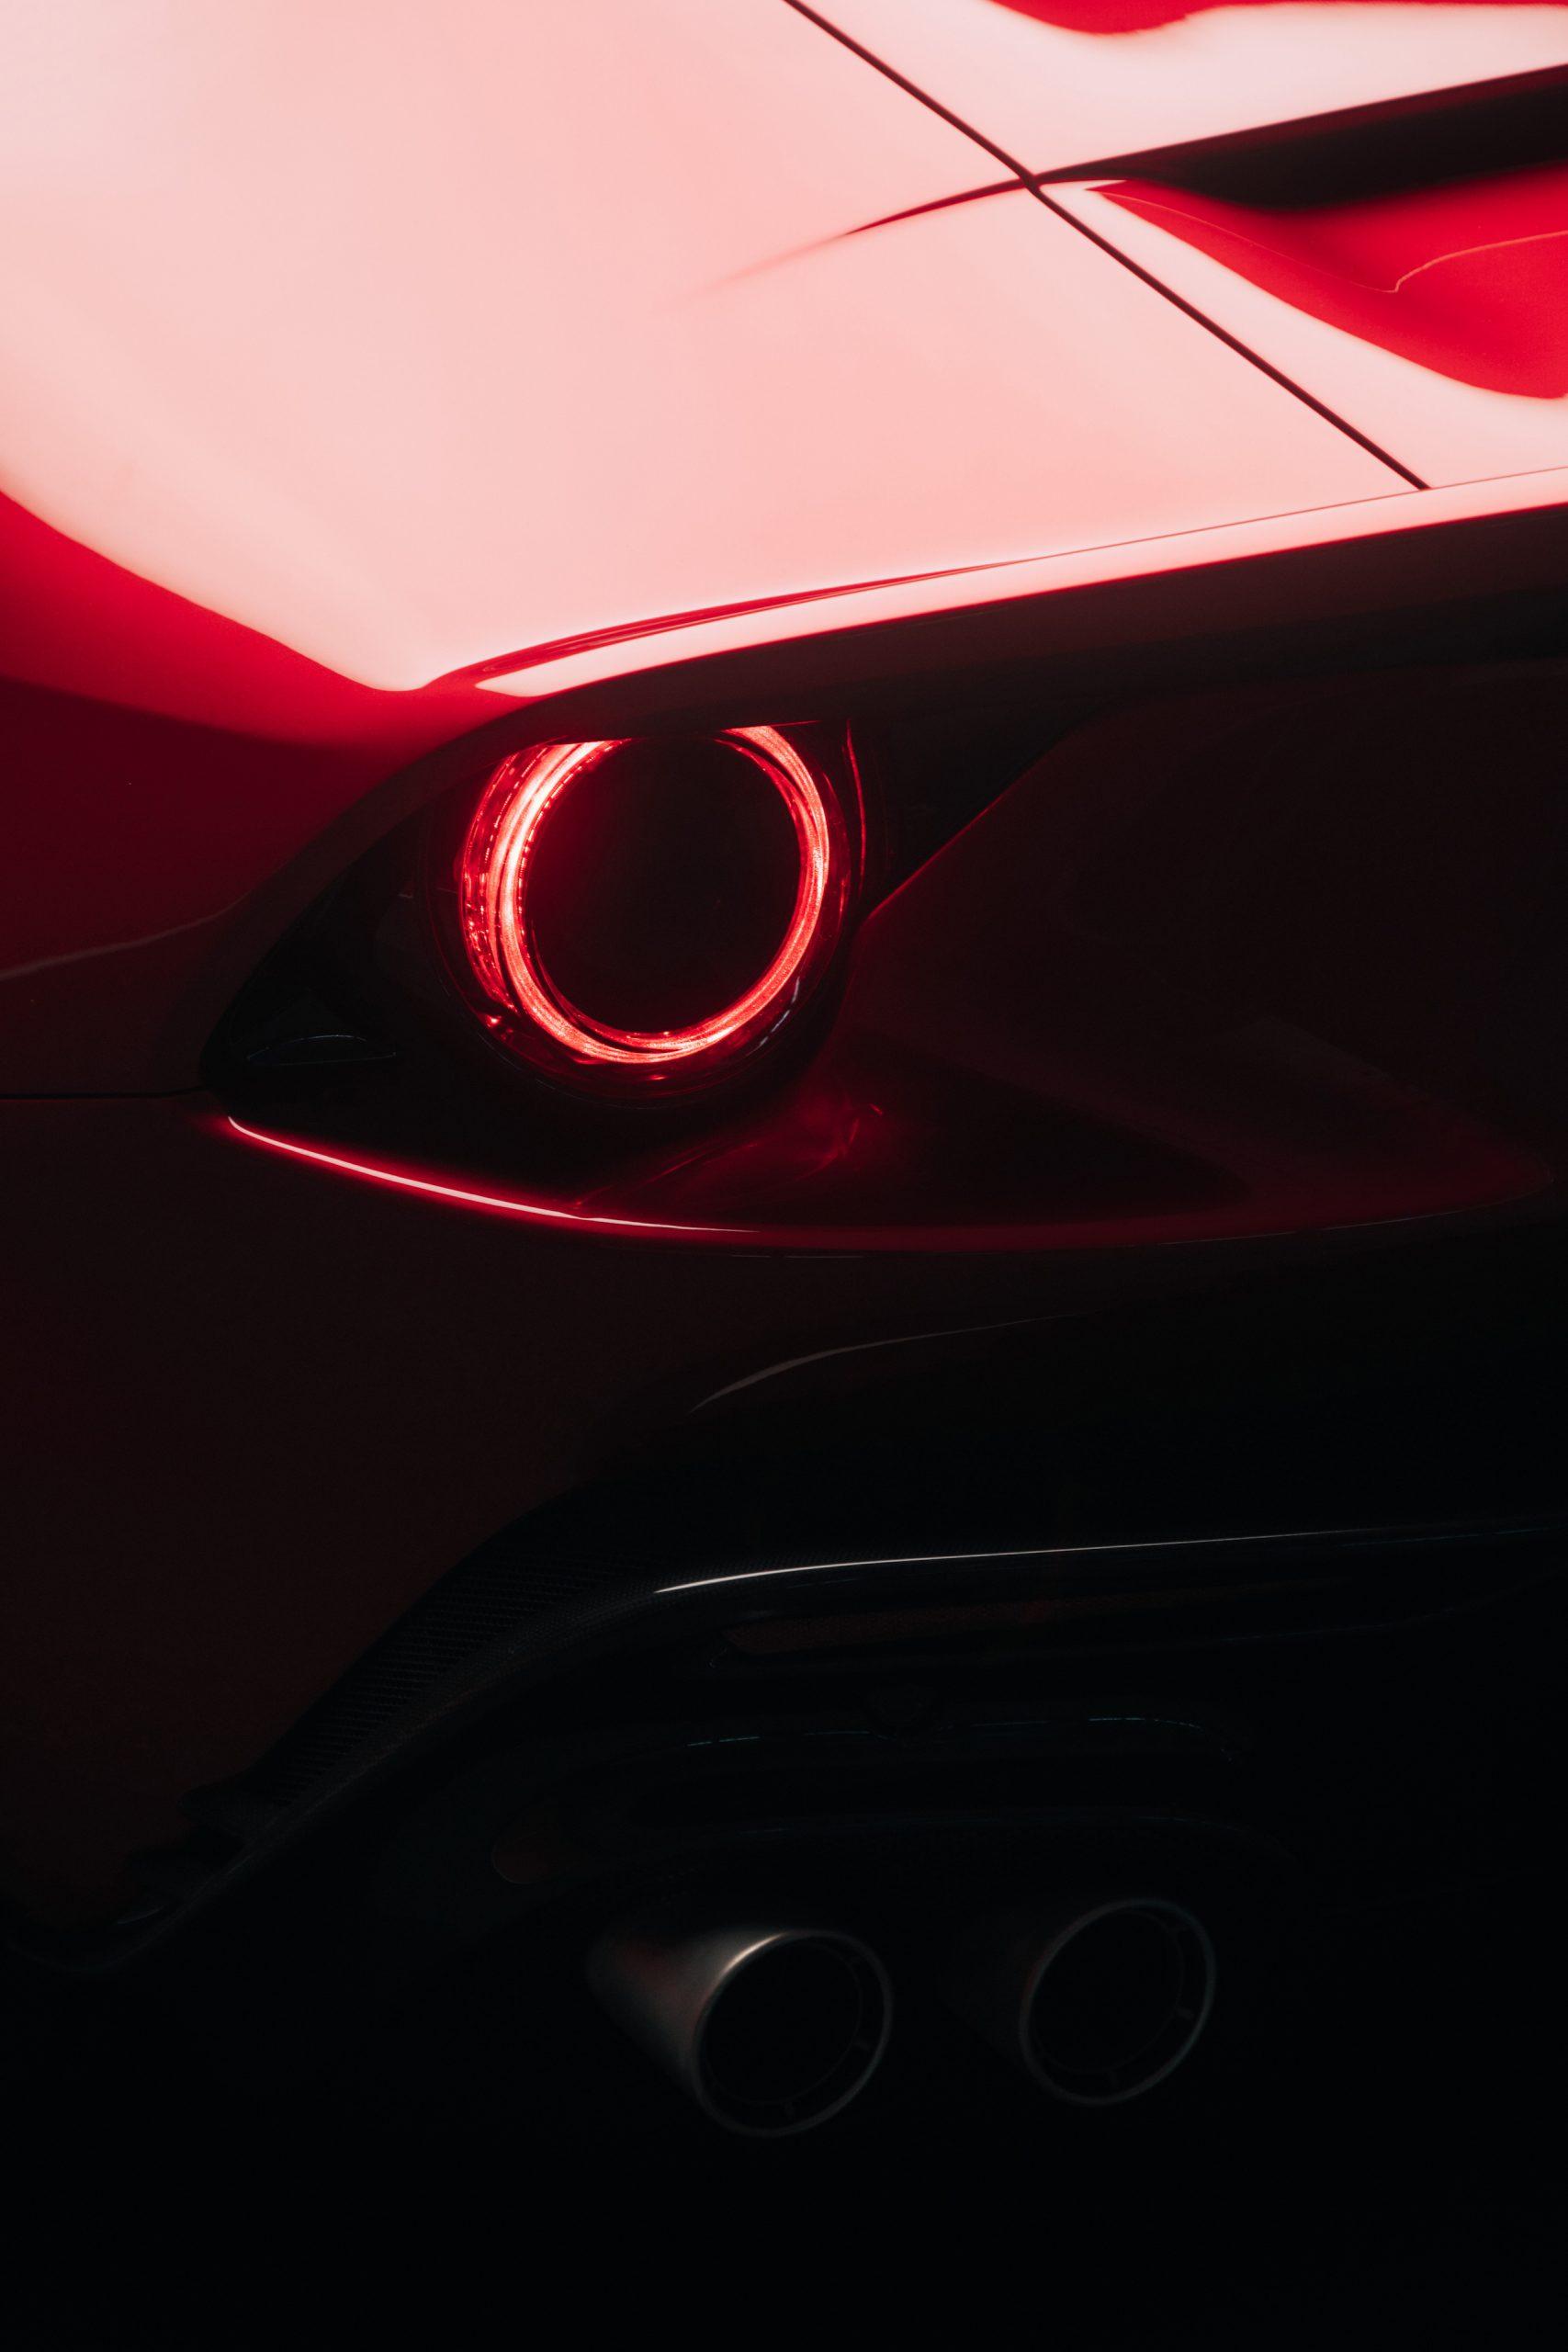 ferrari omologata supercar tail light detail